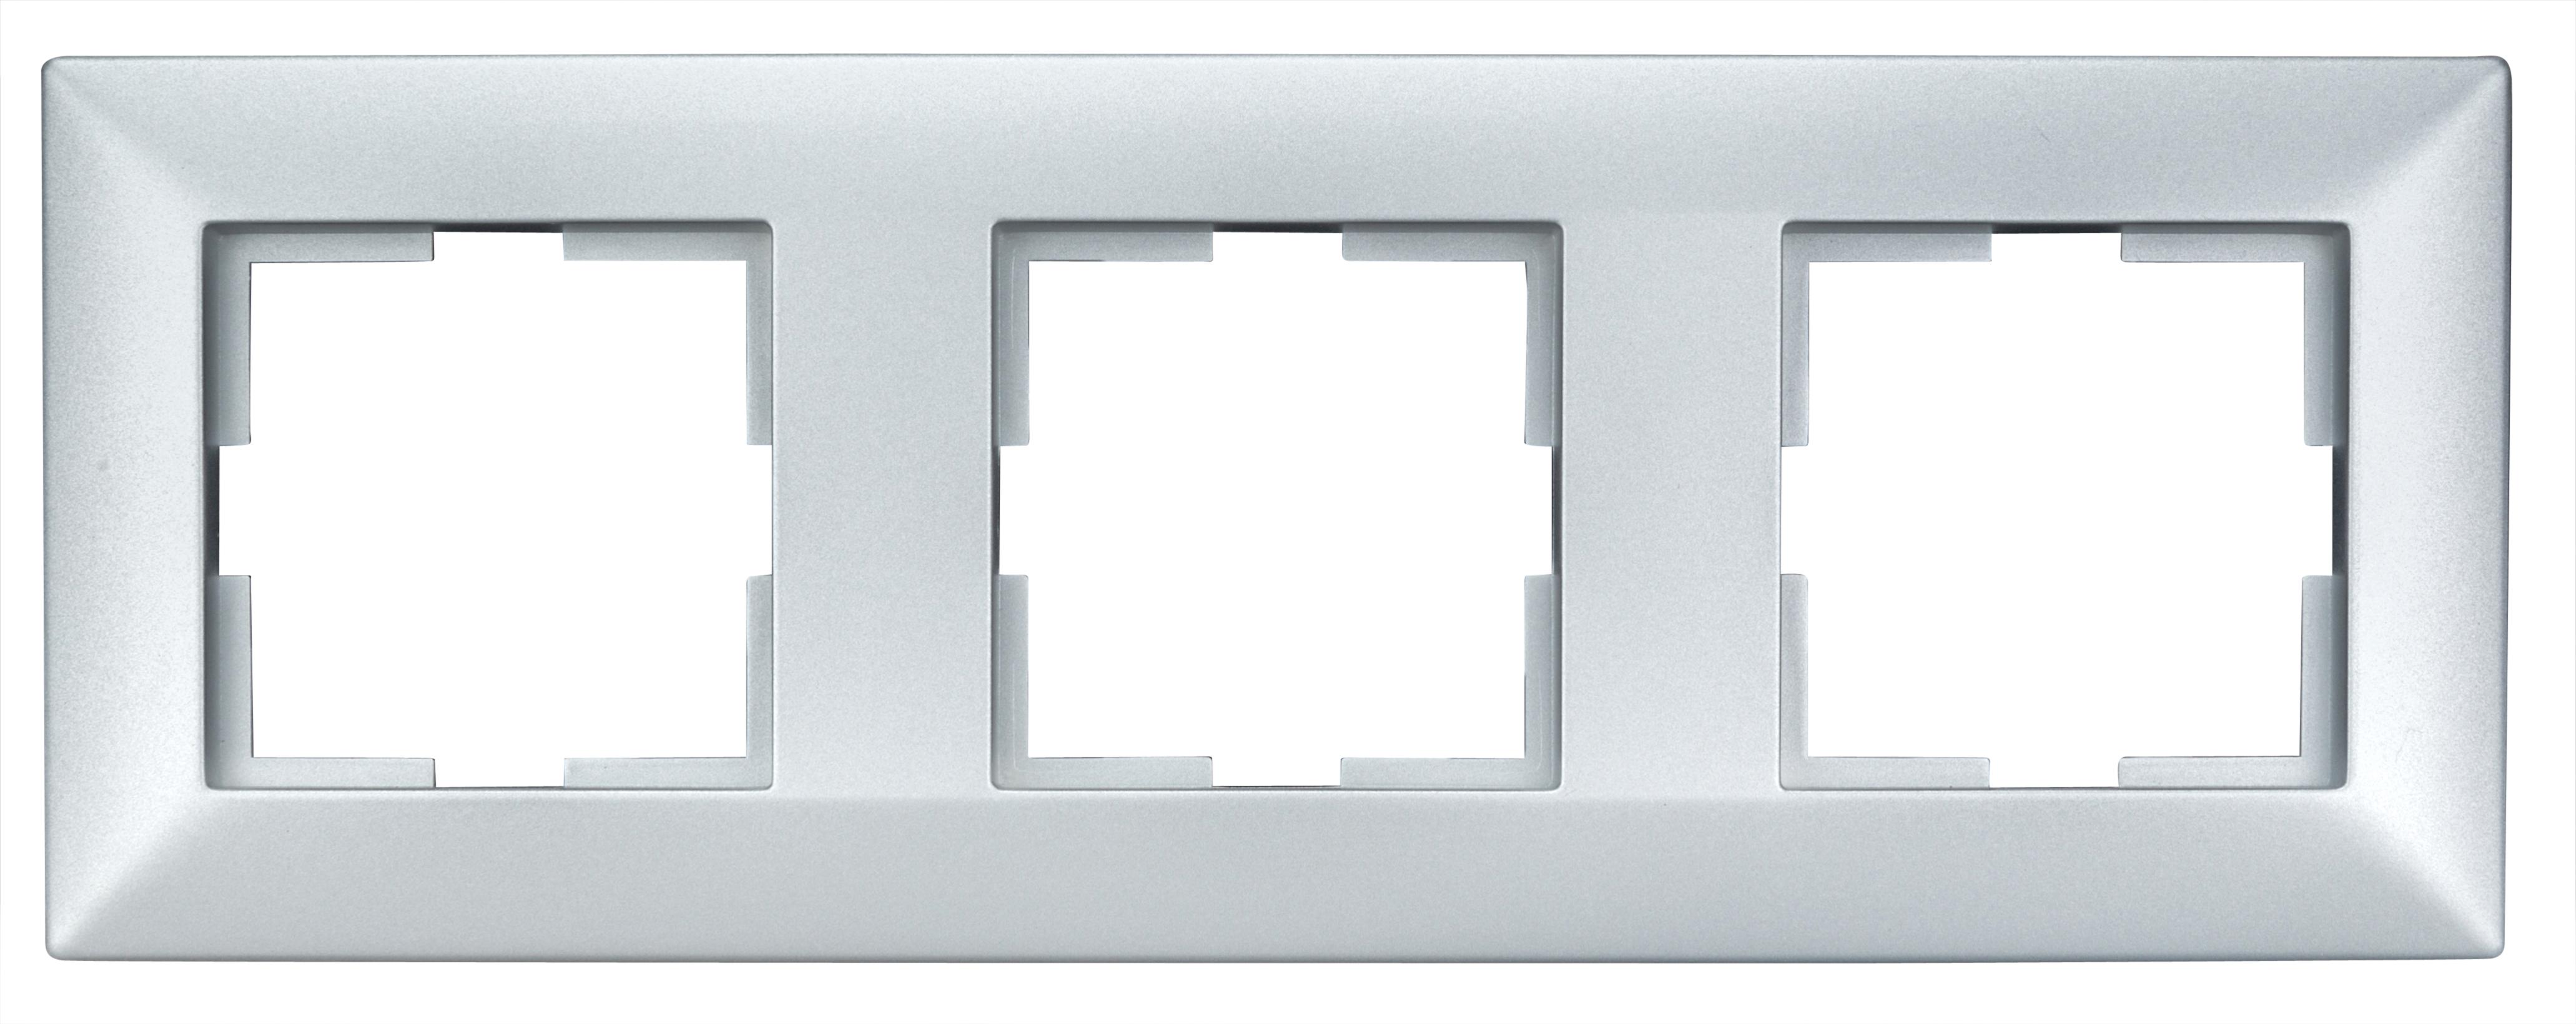 1 Stk Rahmen 3-fach, Silber EV125003--